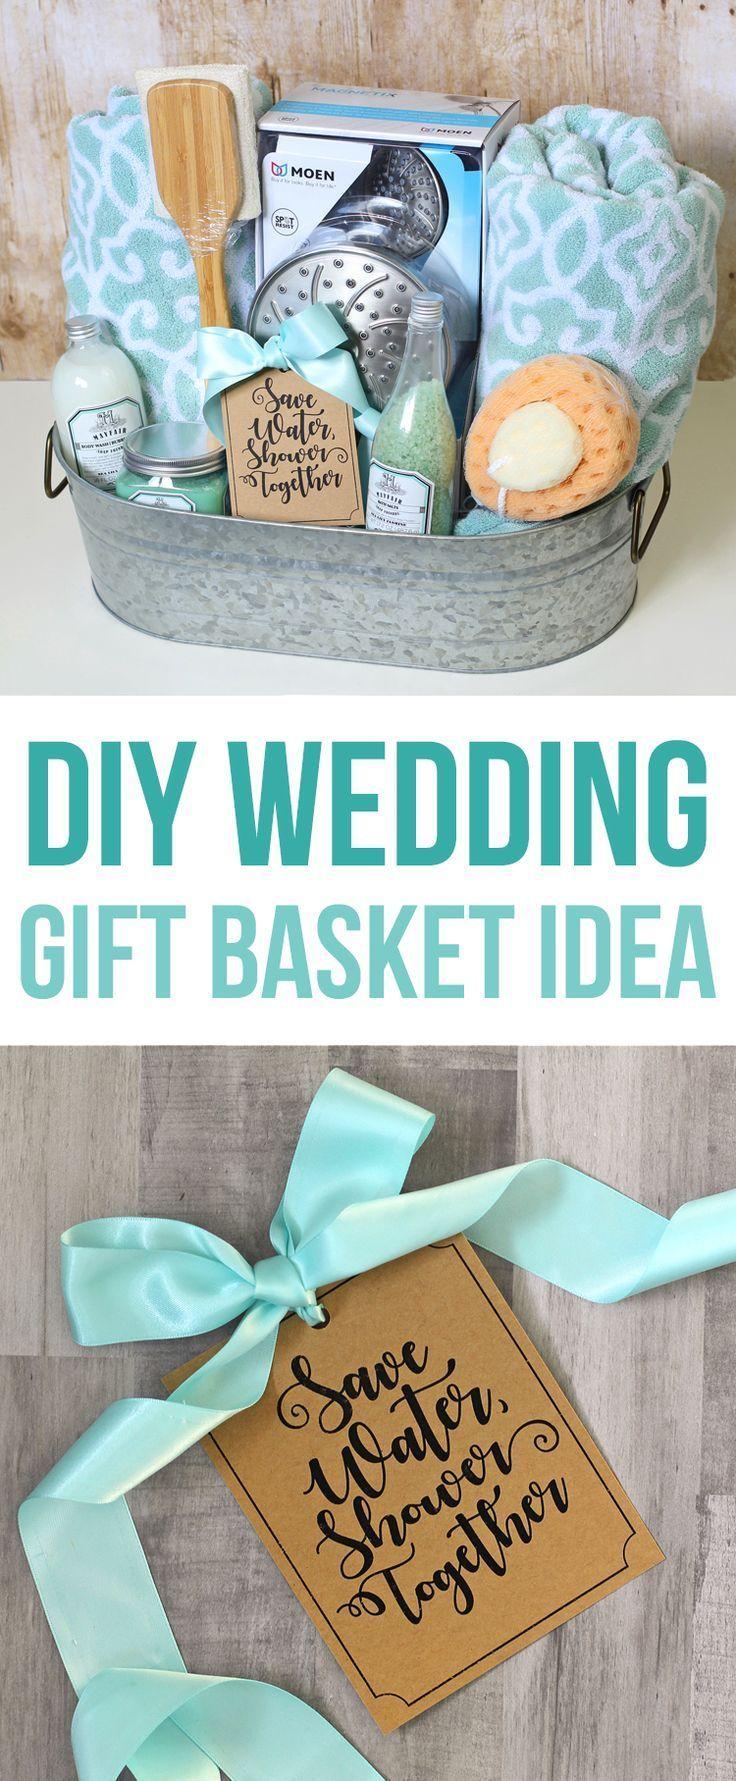 Best 25+ Wedding gift baskets ideas on Pinterest | Bridal ...